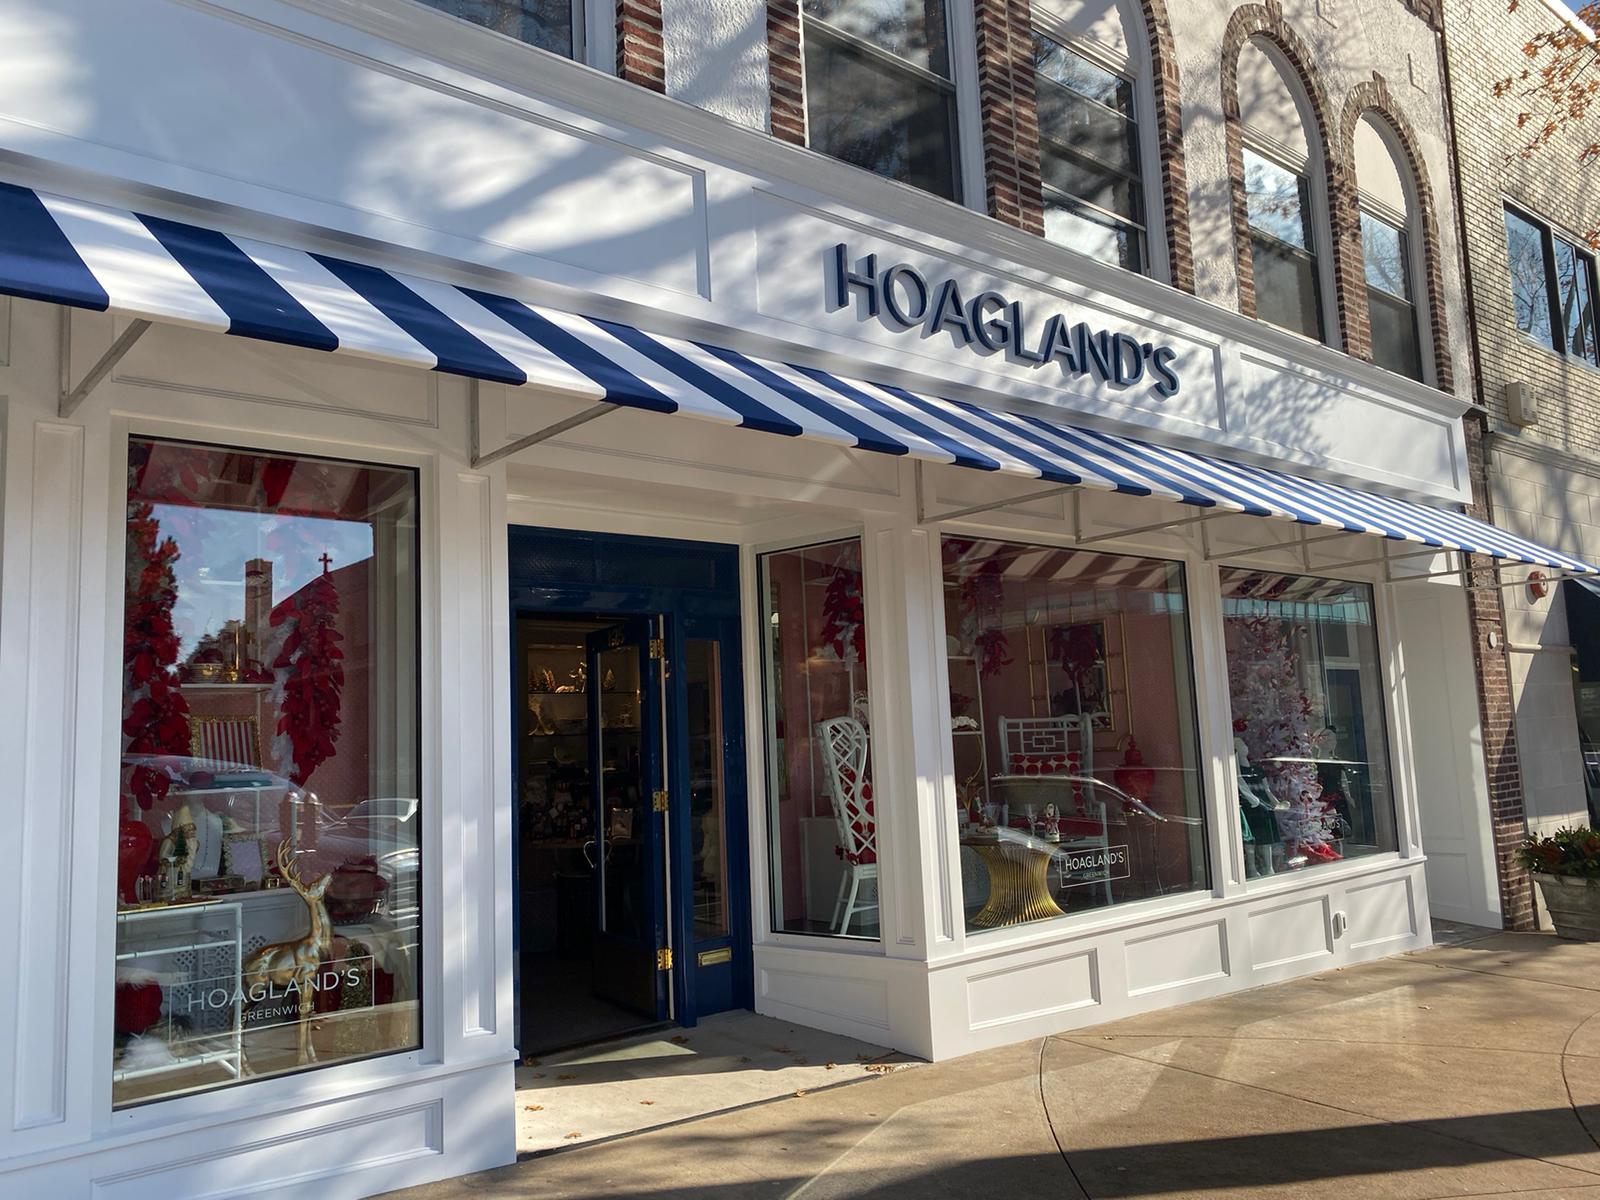 @ Hoaglands of Greenwich, Greenwich, CT (2019-11-26)